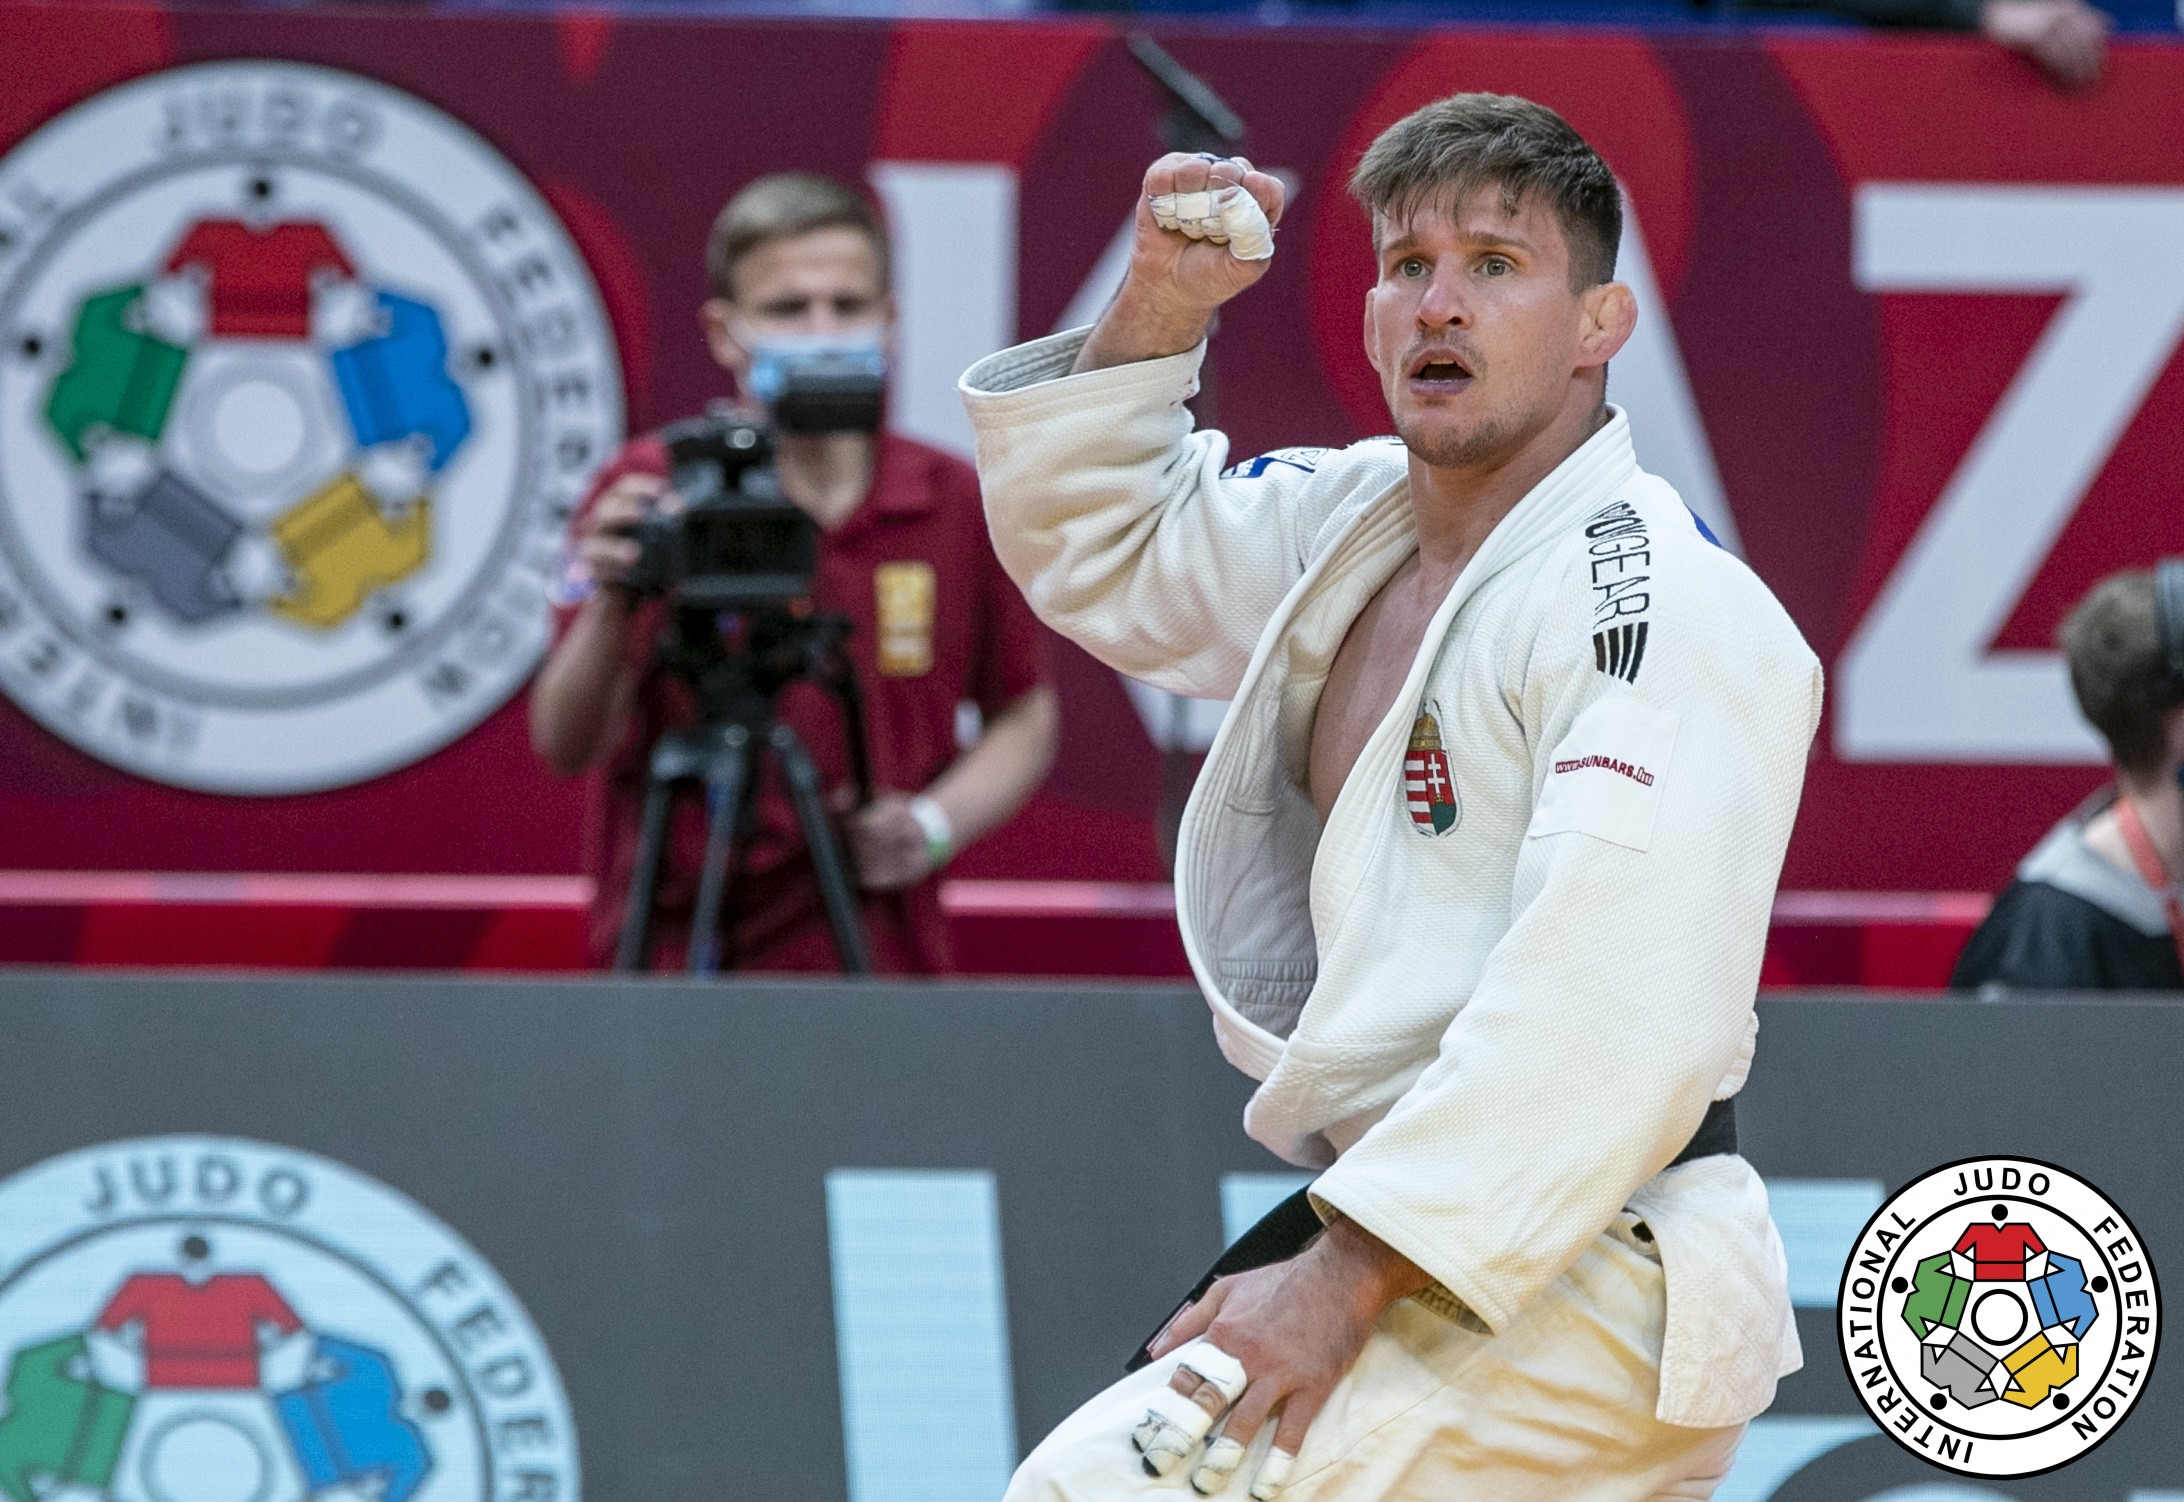 Judo_Grand_Slam_Kazan_2021_Attila_Ungvari_81kg_1